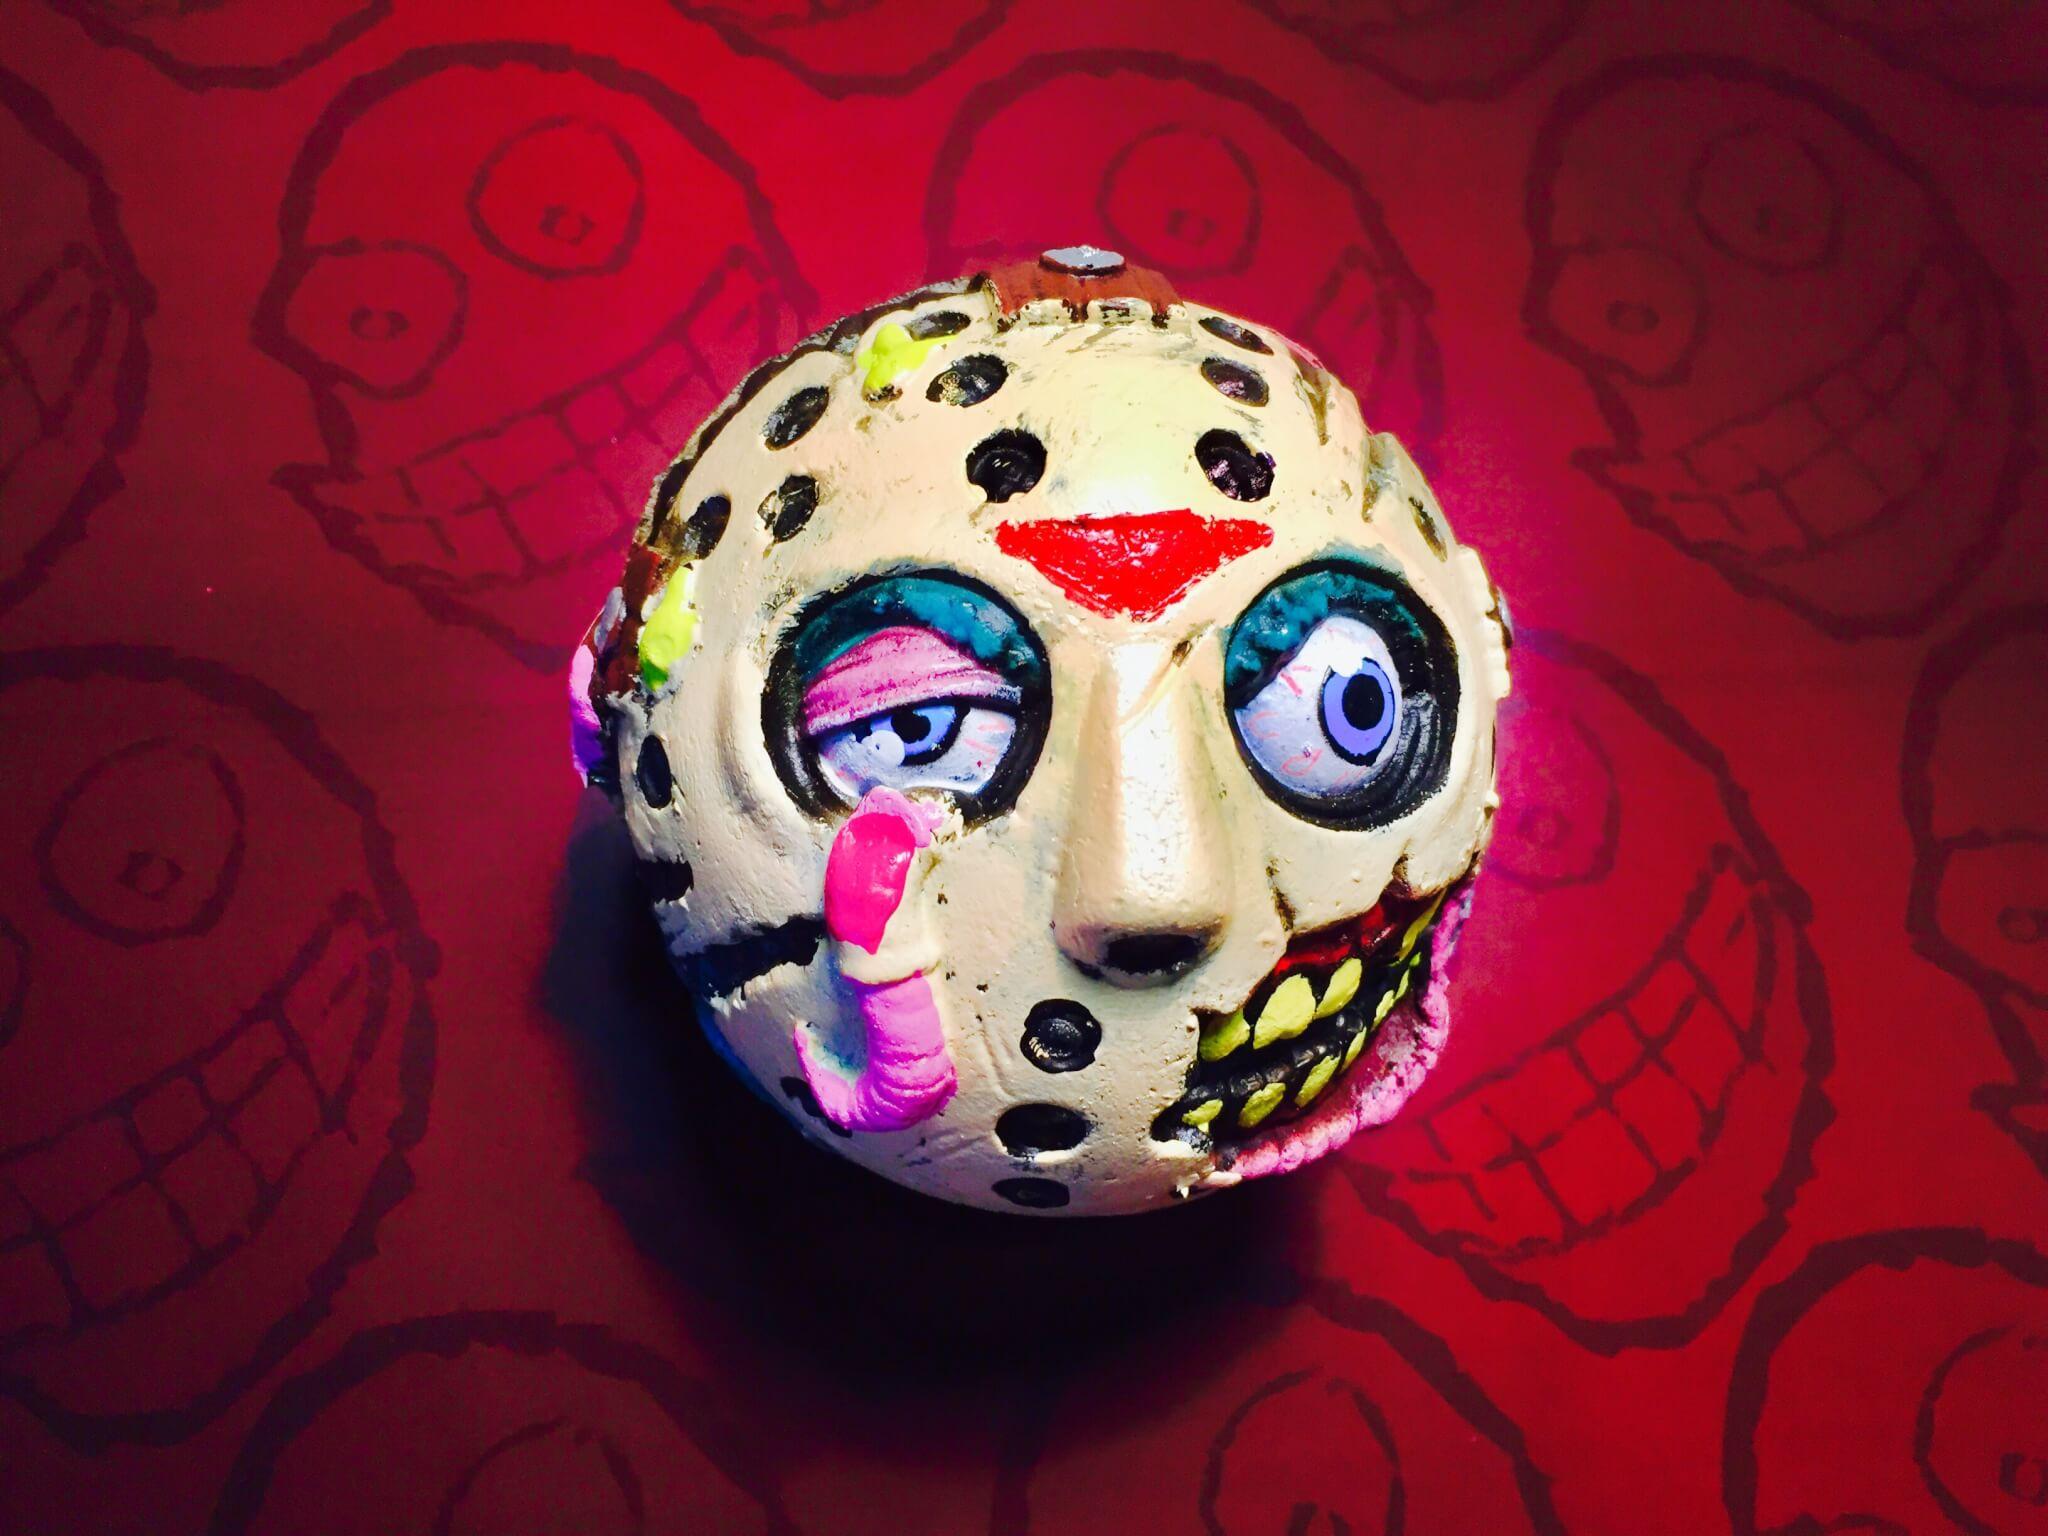 Jason Madballs by Kidrobot